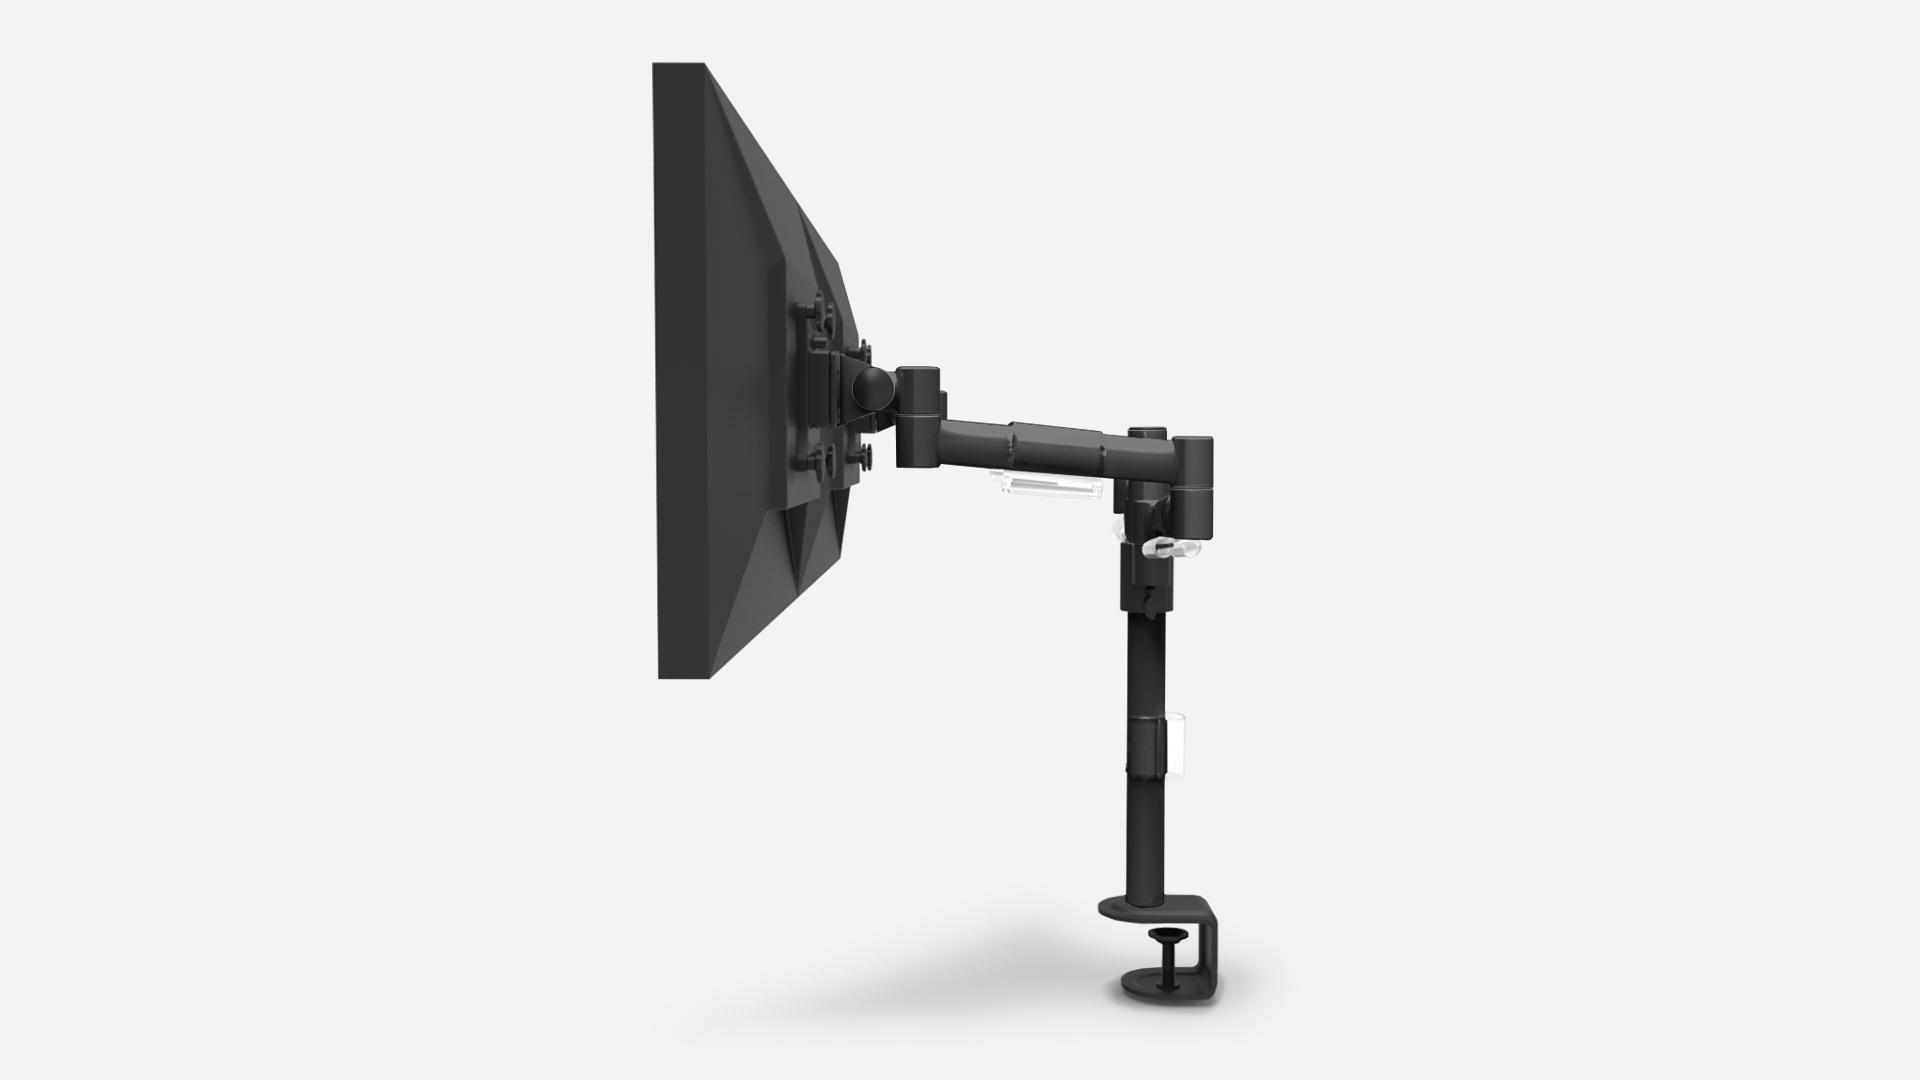 Monitor Mount - STANDING DESK ACCESSORIES